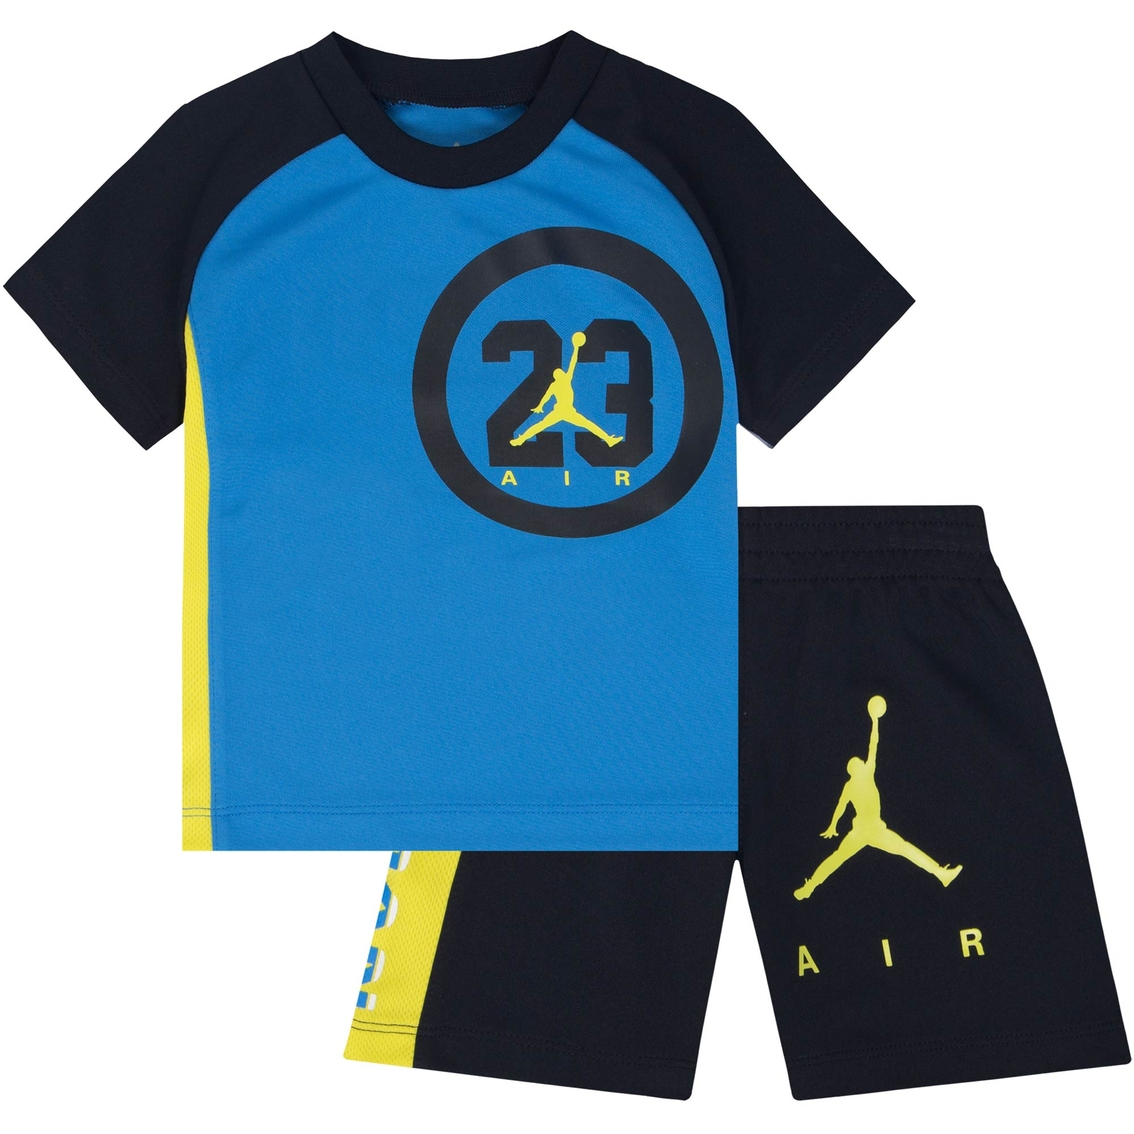 0db1230a0af Jordan Infant Boys 2 Pc. Tricot Tank And Shorts Set | Baby Boy 0-24 ...